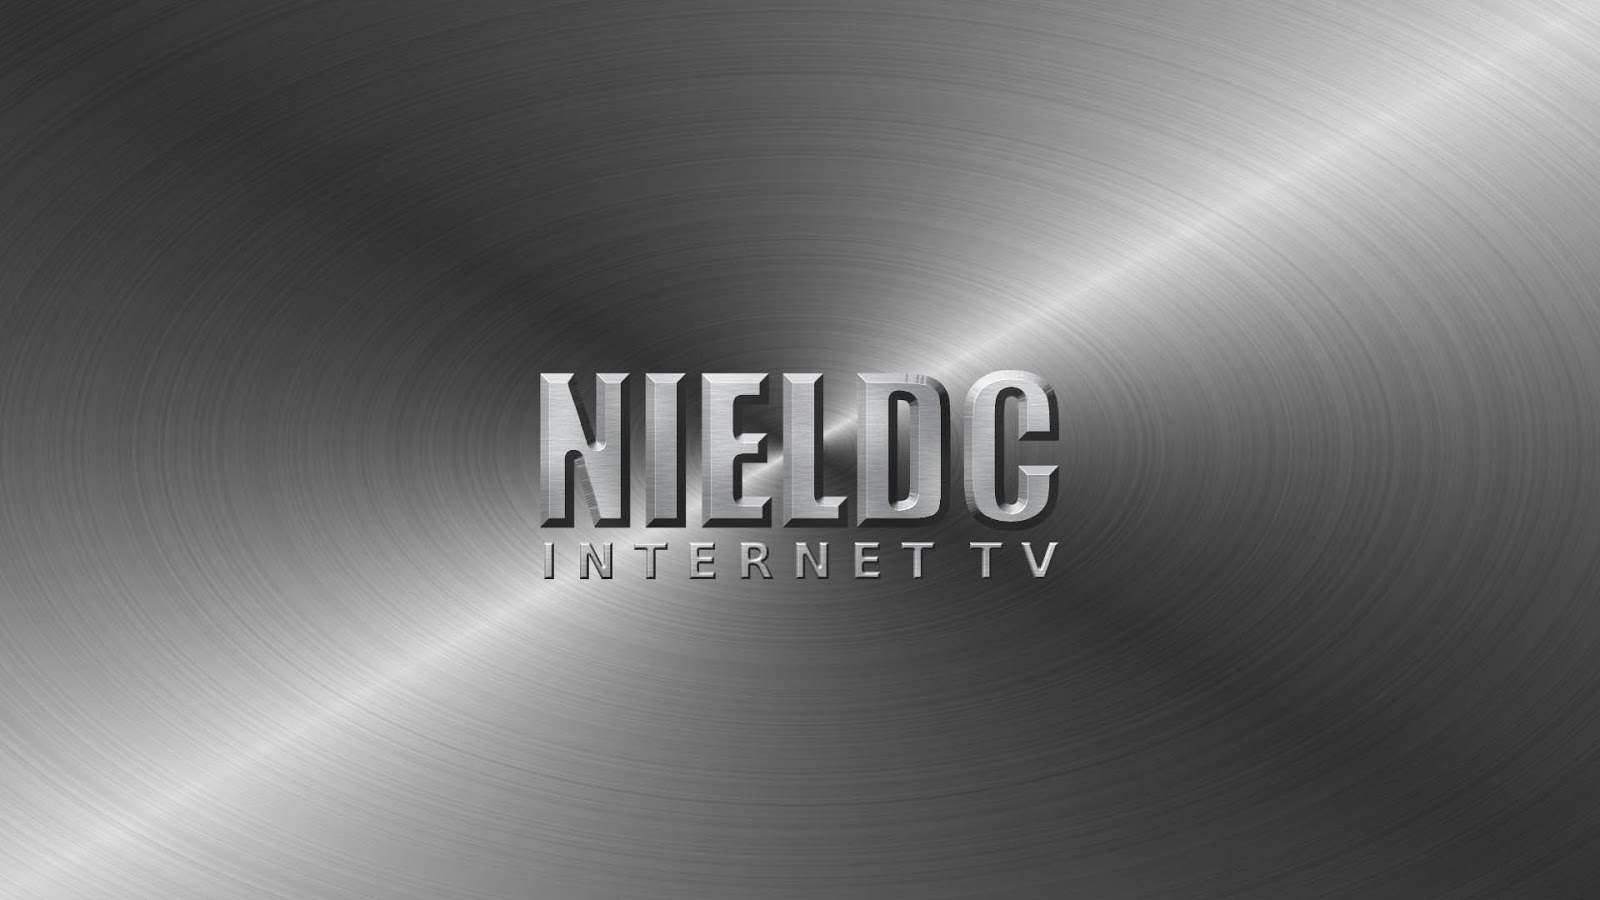 Best Kodi Addons August 2020.Nieldc Iptv Addon Kodi Repo Url New Best For Kodi 2020